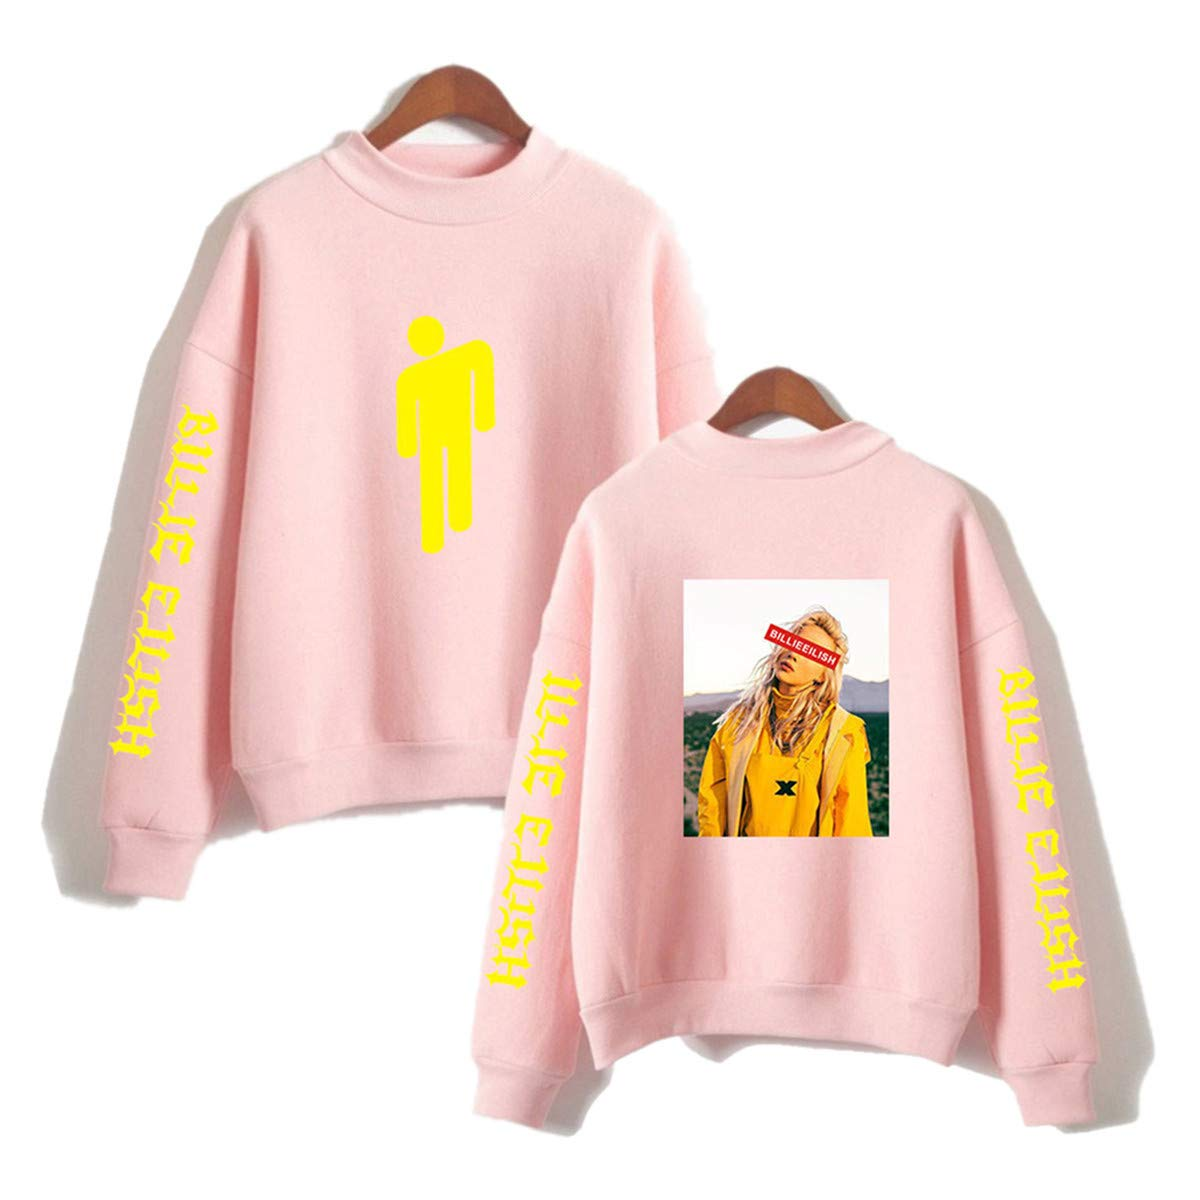 Formesy Donna Billie Eilish Fans Felpe Ragazze Casual Cool Hip Pop Maglia Carina High Collar Pullover Loose Fashion Oversized Fitting Street Top